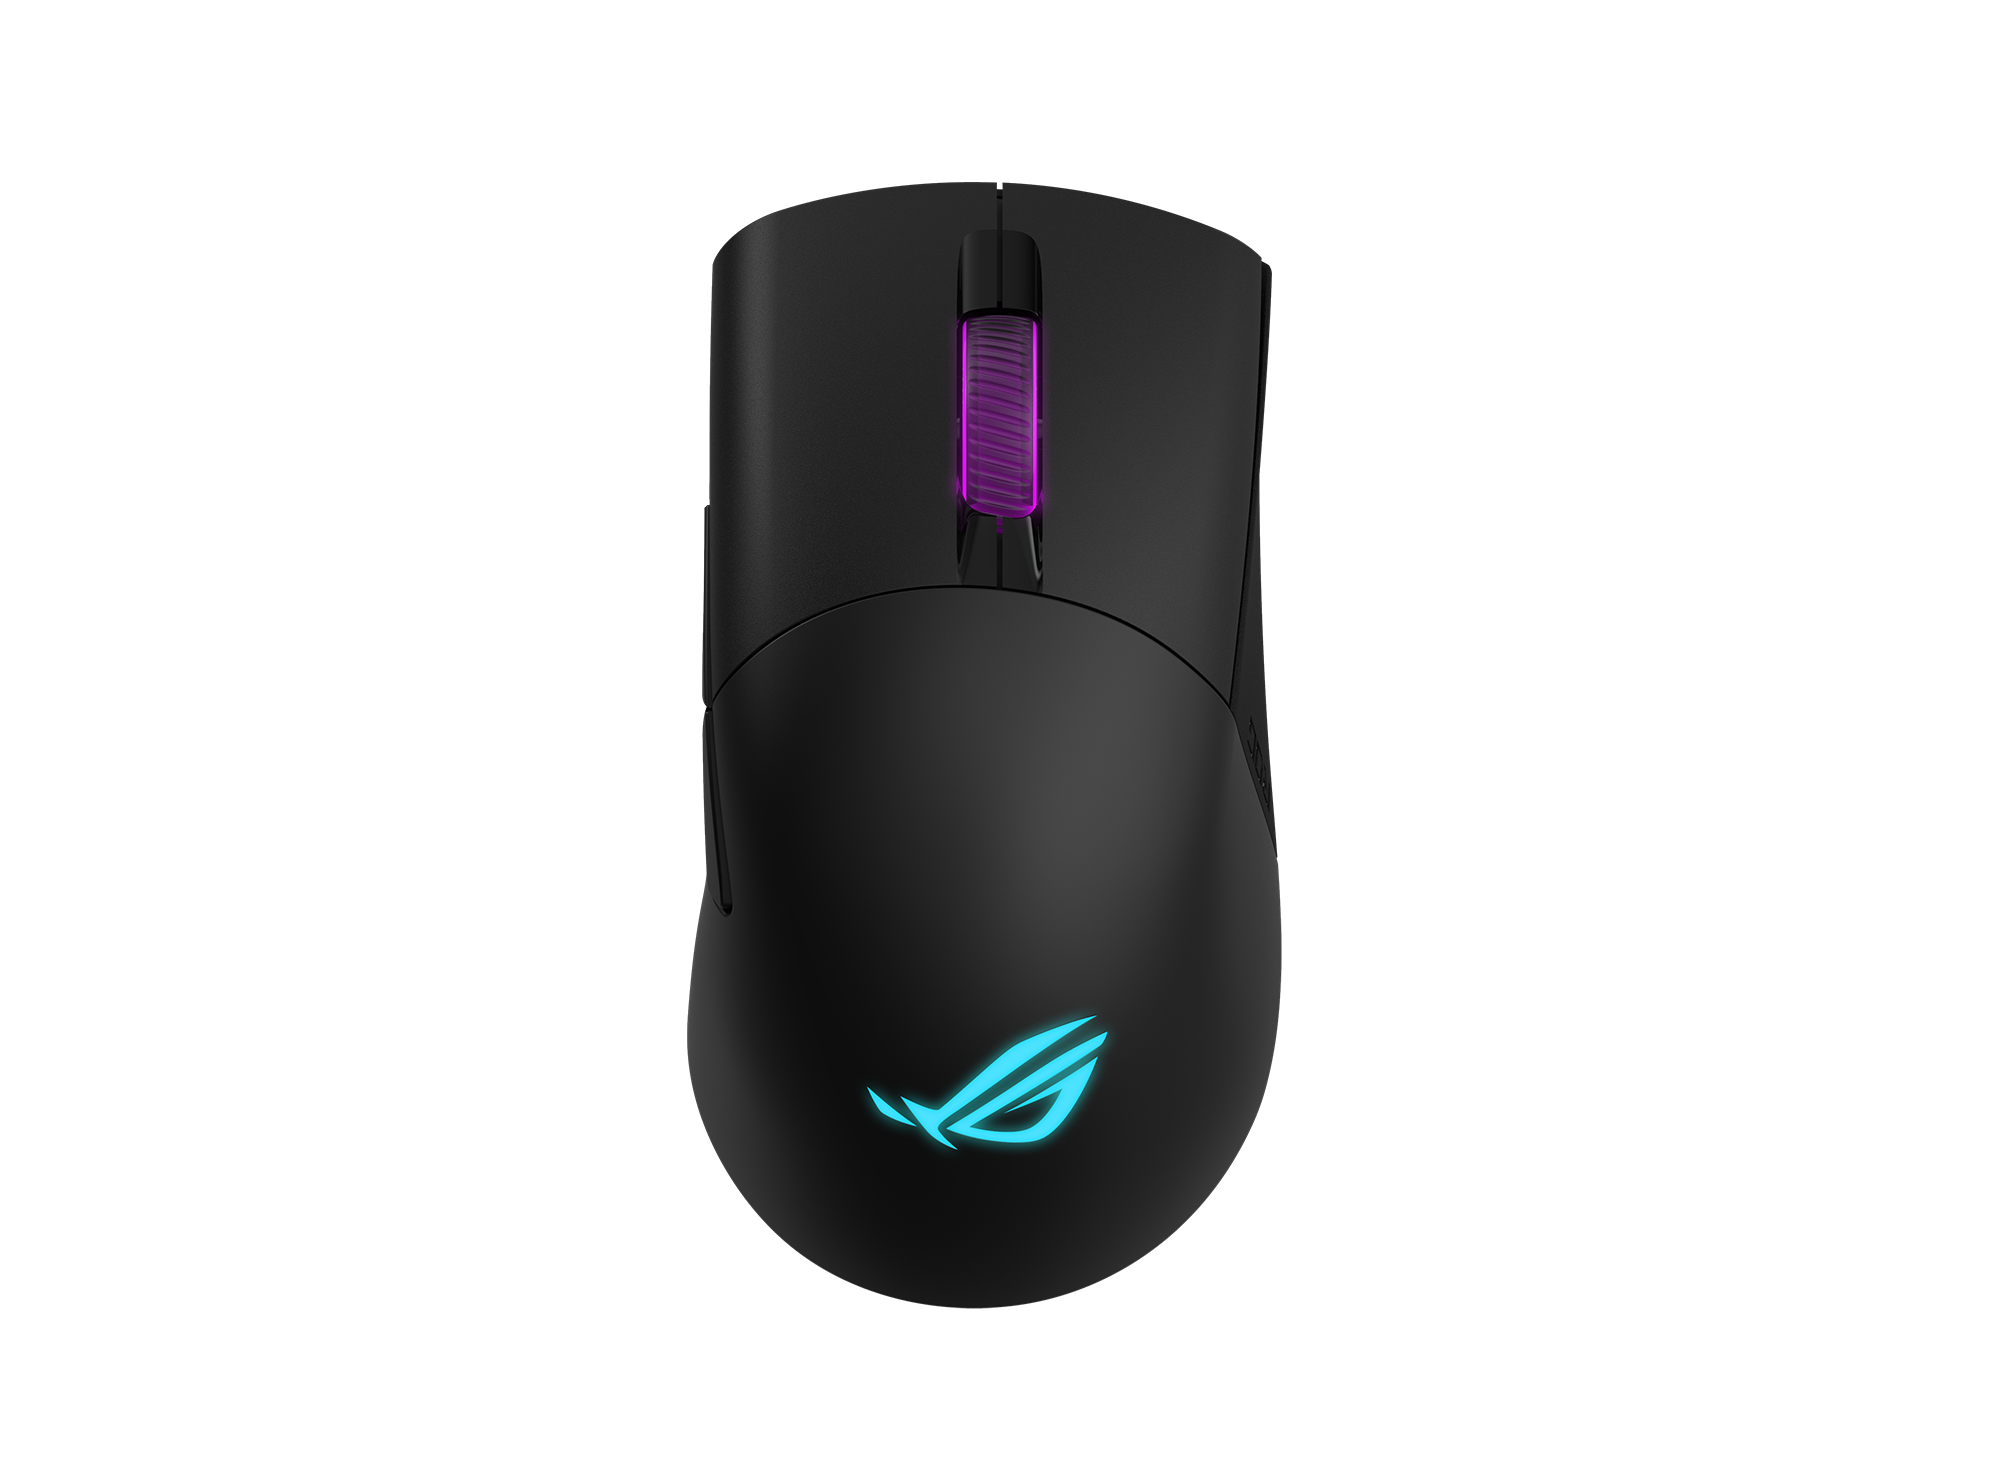 ASUS ROG Keris WiFi BT Mouse